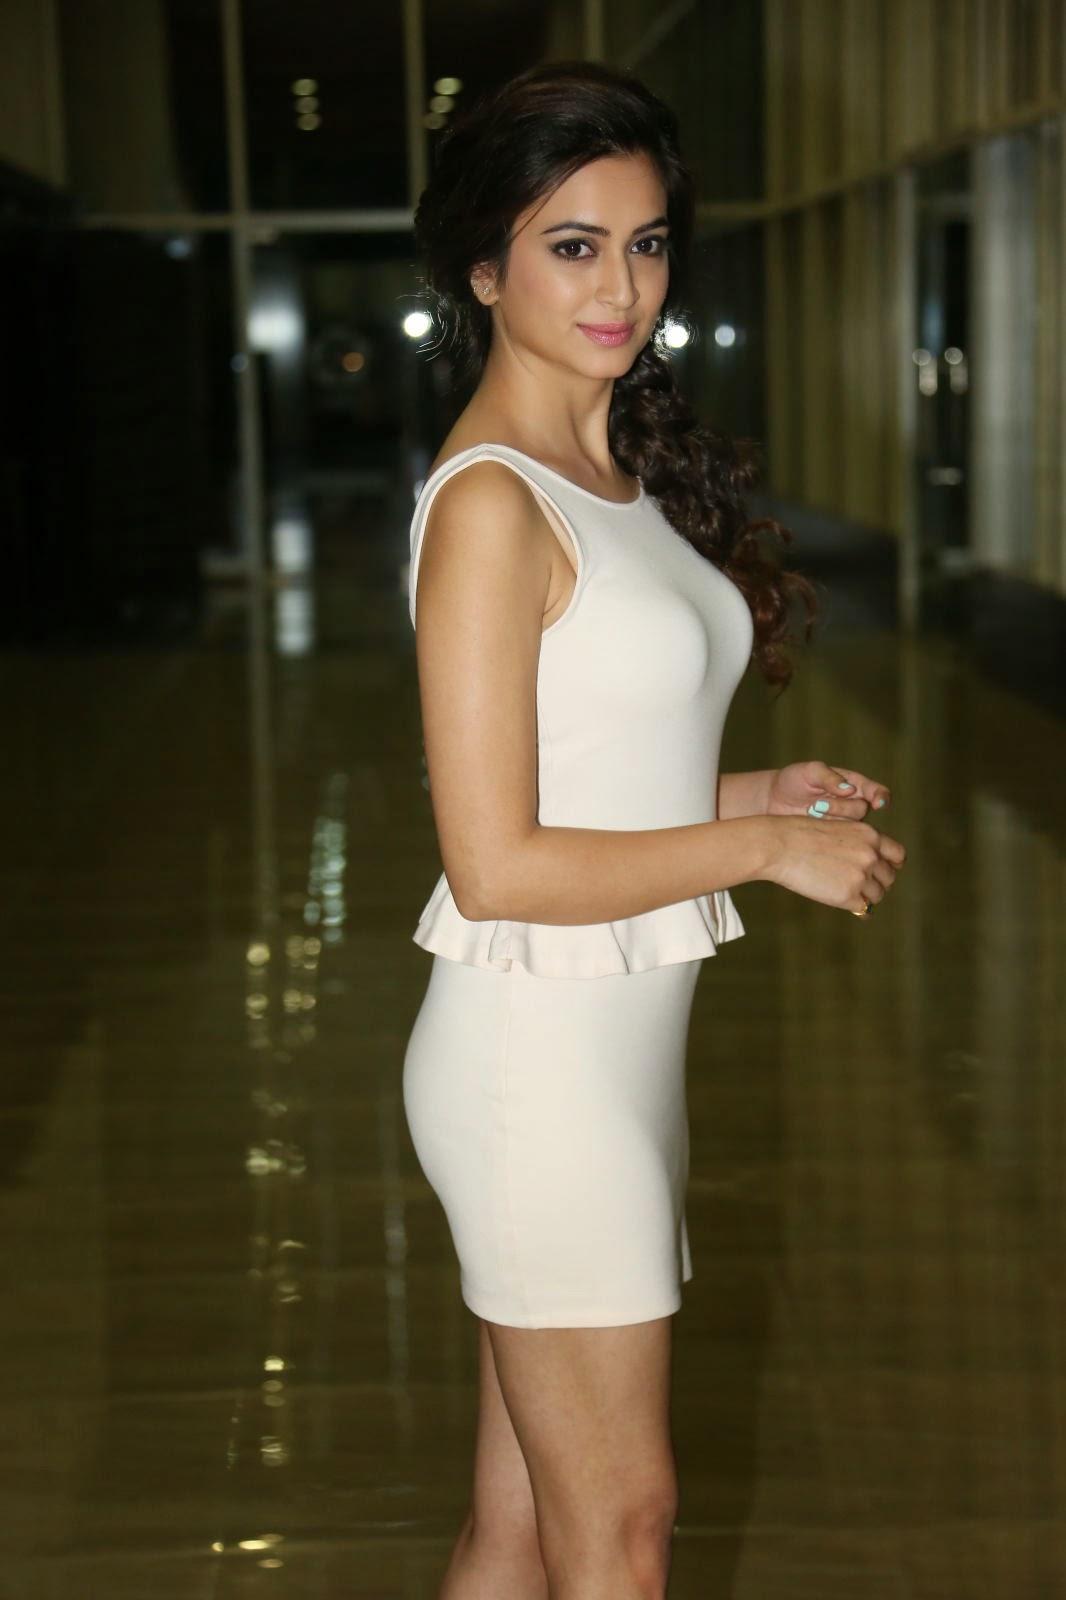 Aishwarya Arjun Hot Bikini Bra Cleavage Images, Thighs